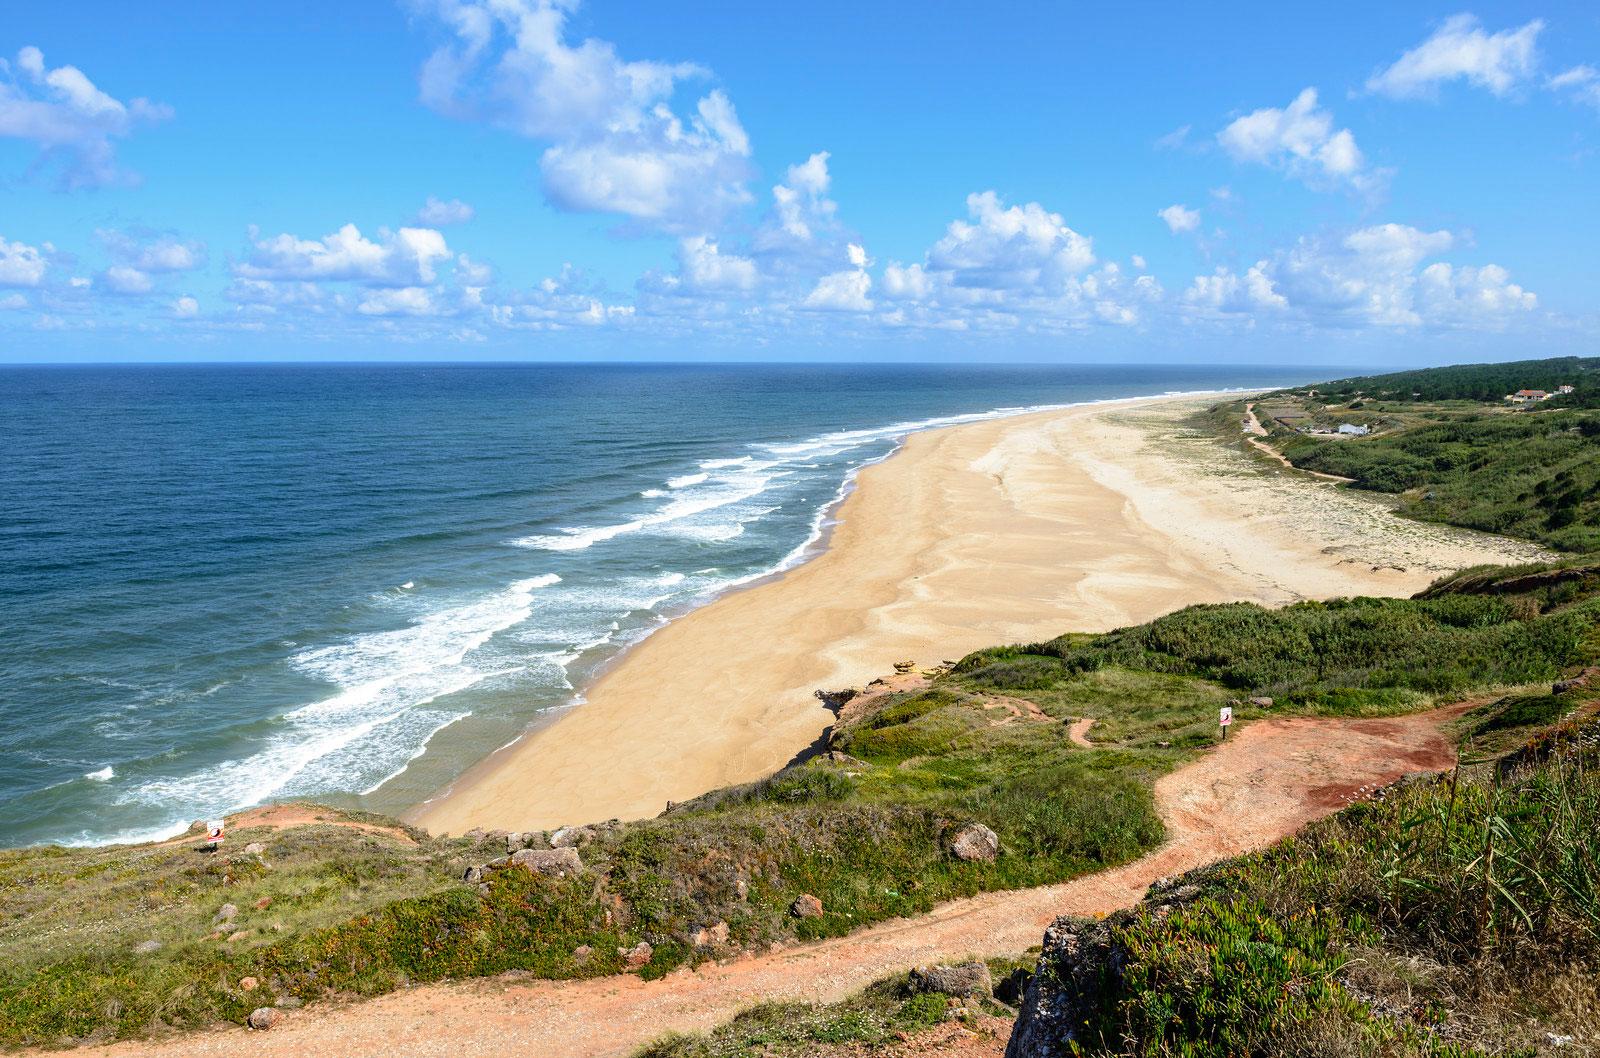 Praia Do Norte Nazare Central Portugal Beaches Travel Guide